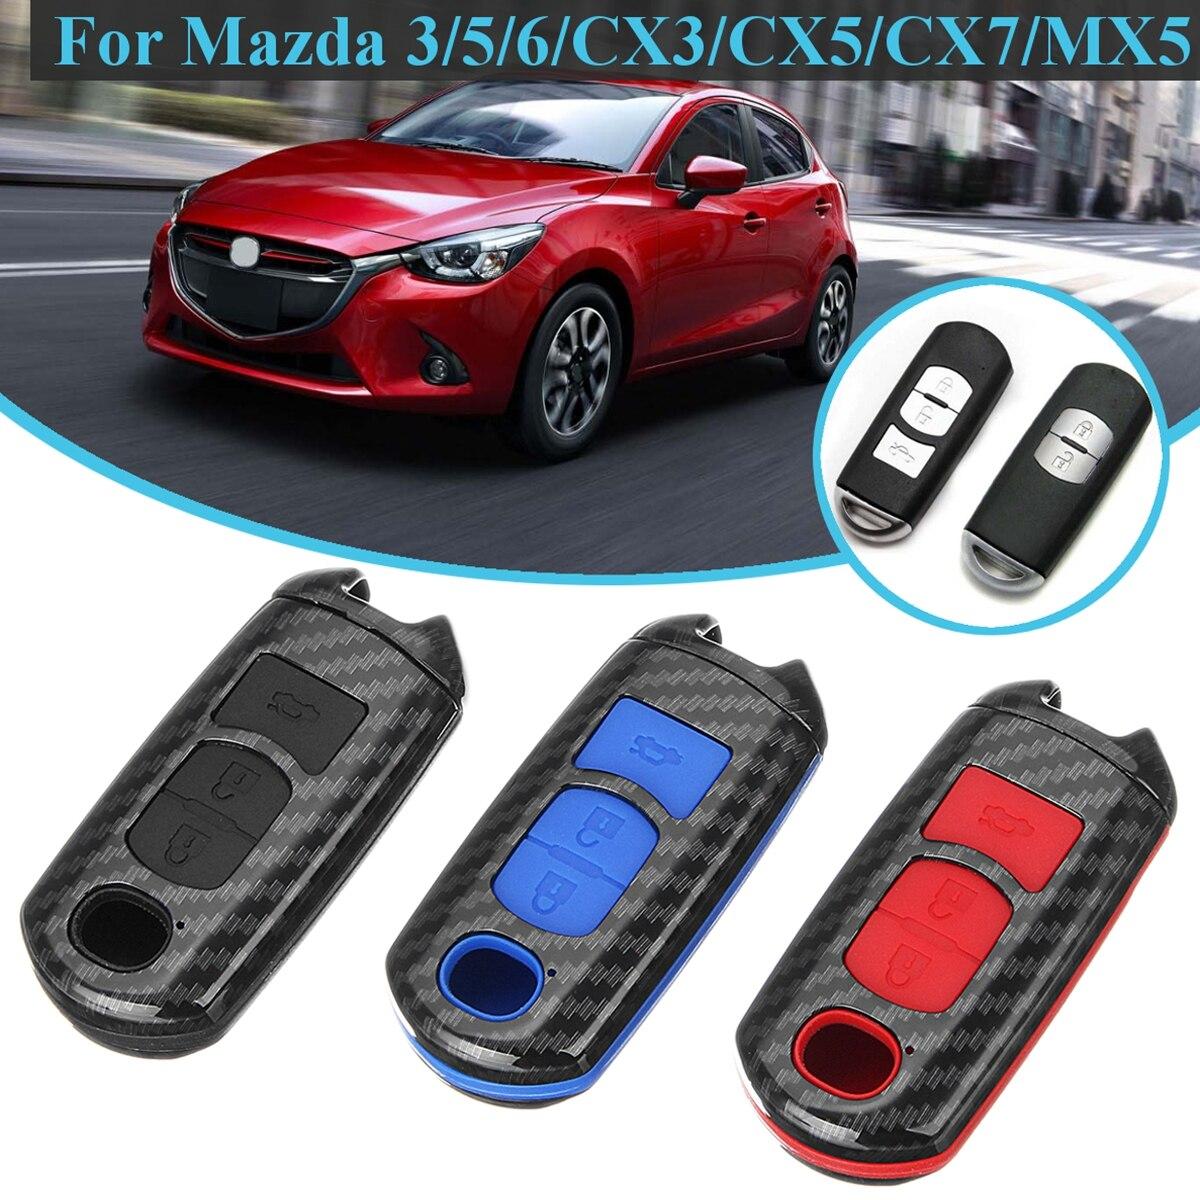 MAZDASPEED Carbon Fiber License Plate Frame Mazda 2 3 5 6 RX7 RX8 Miata MX5 CX9